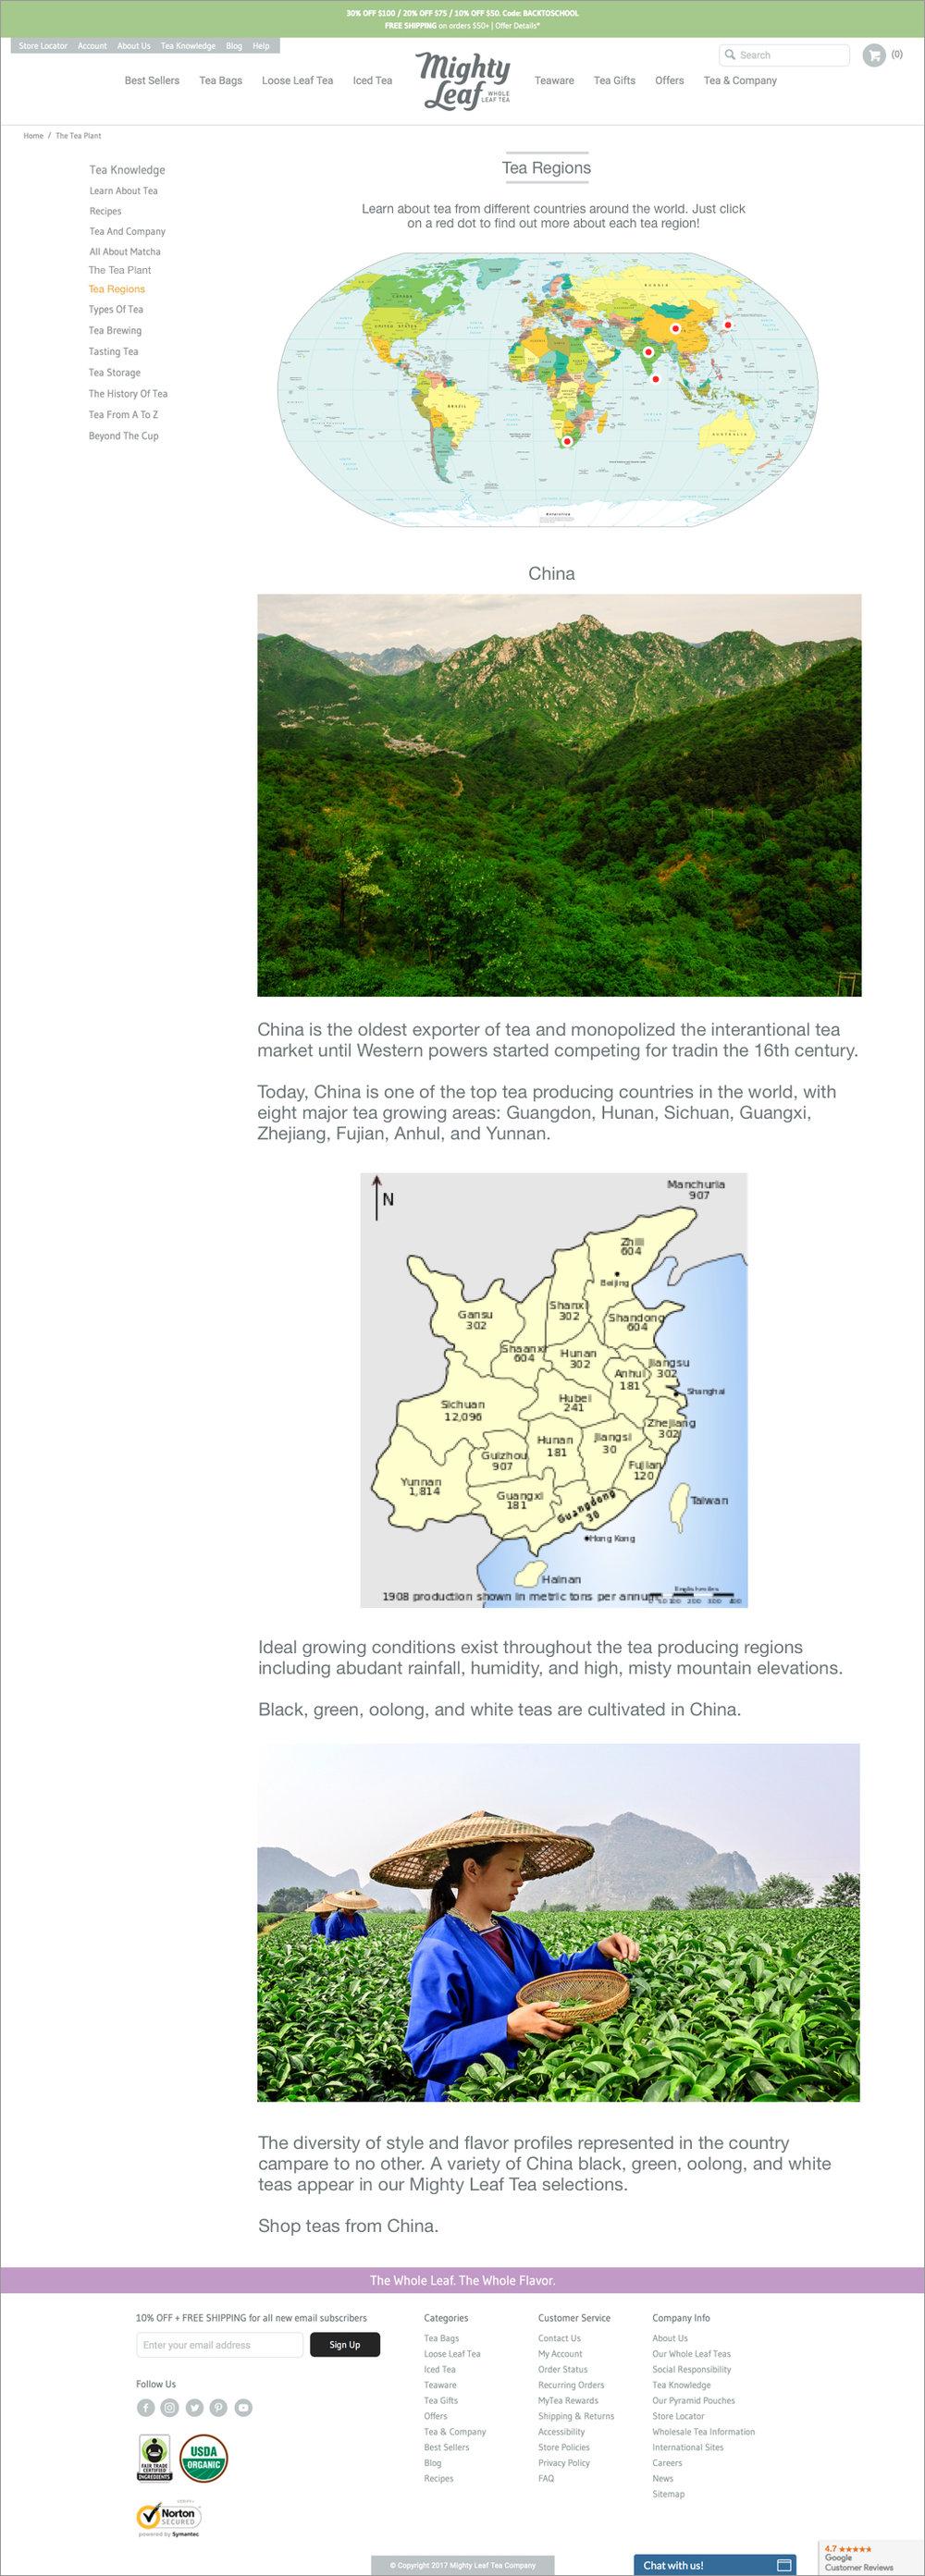 tea-region-china.jpg